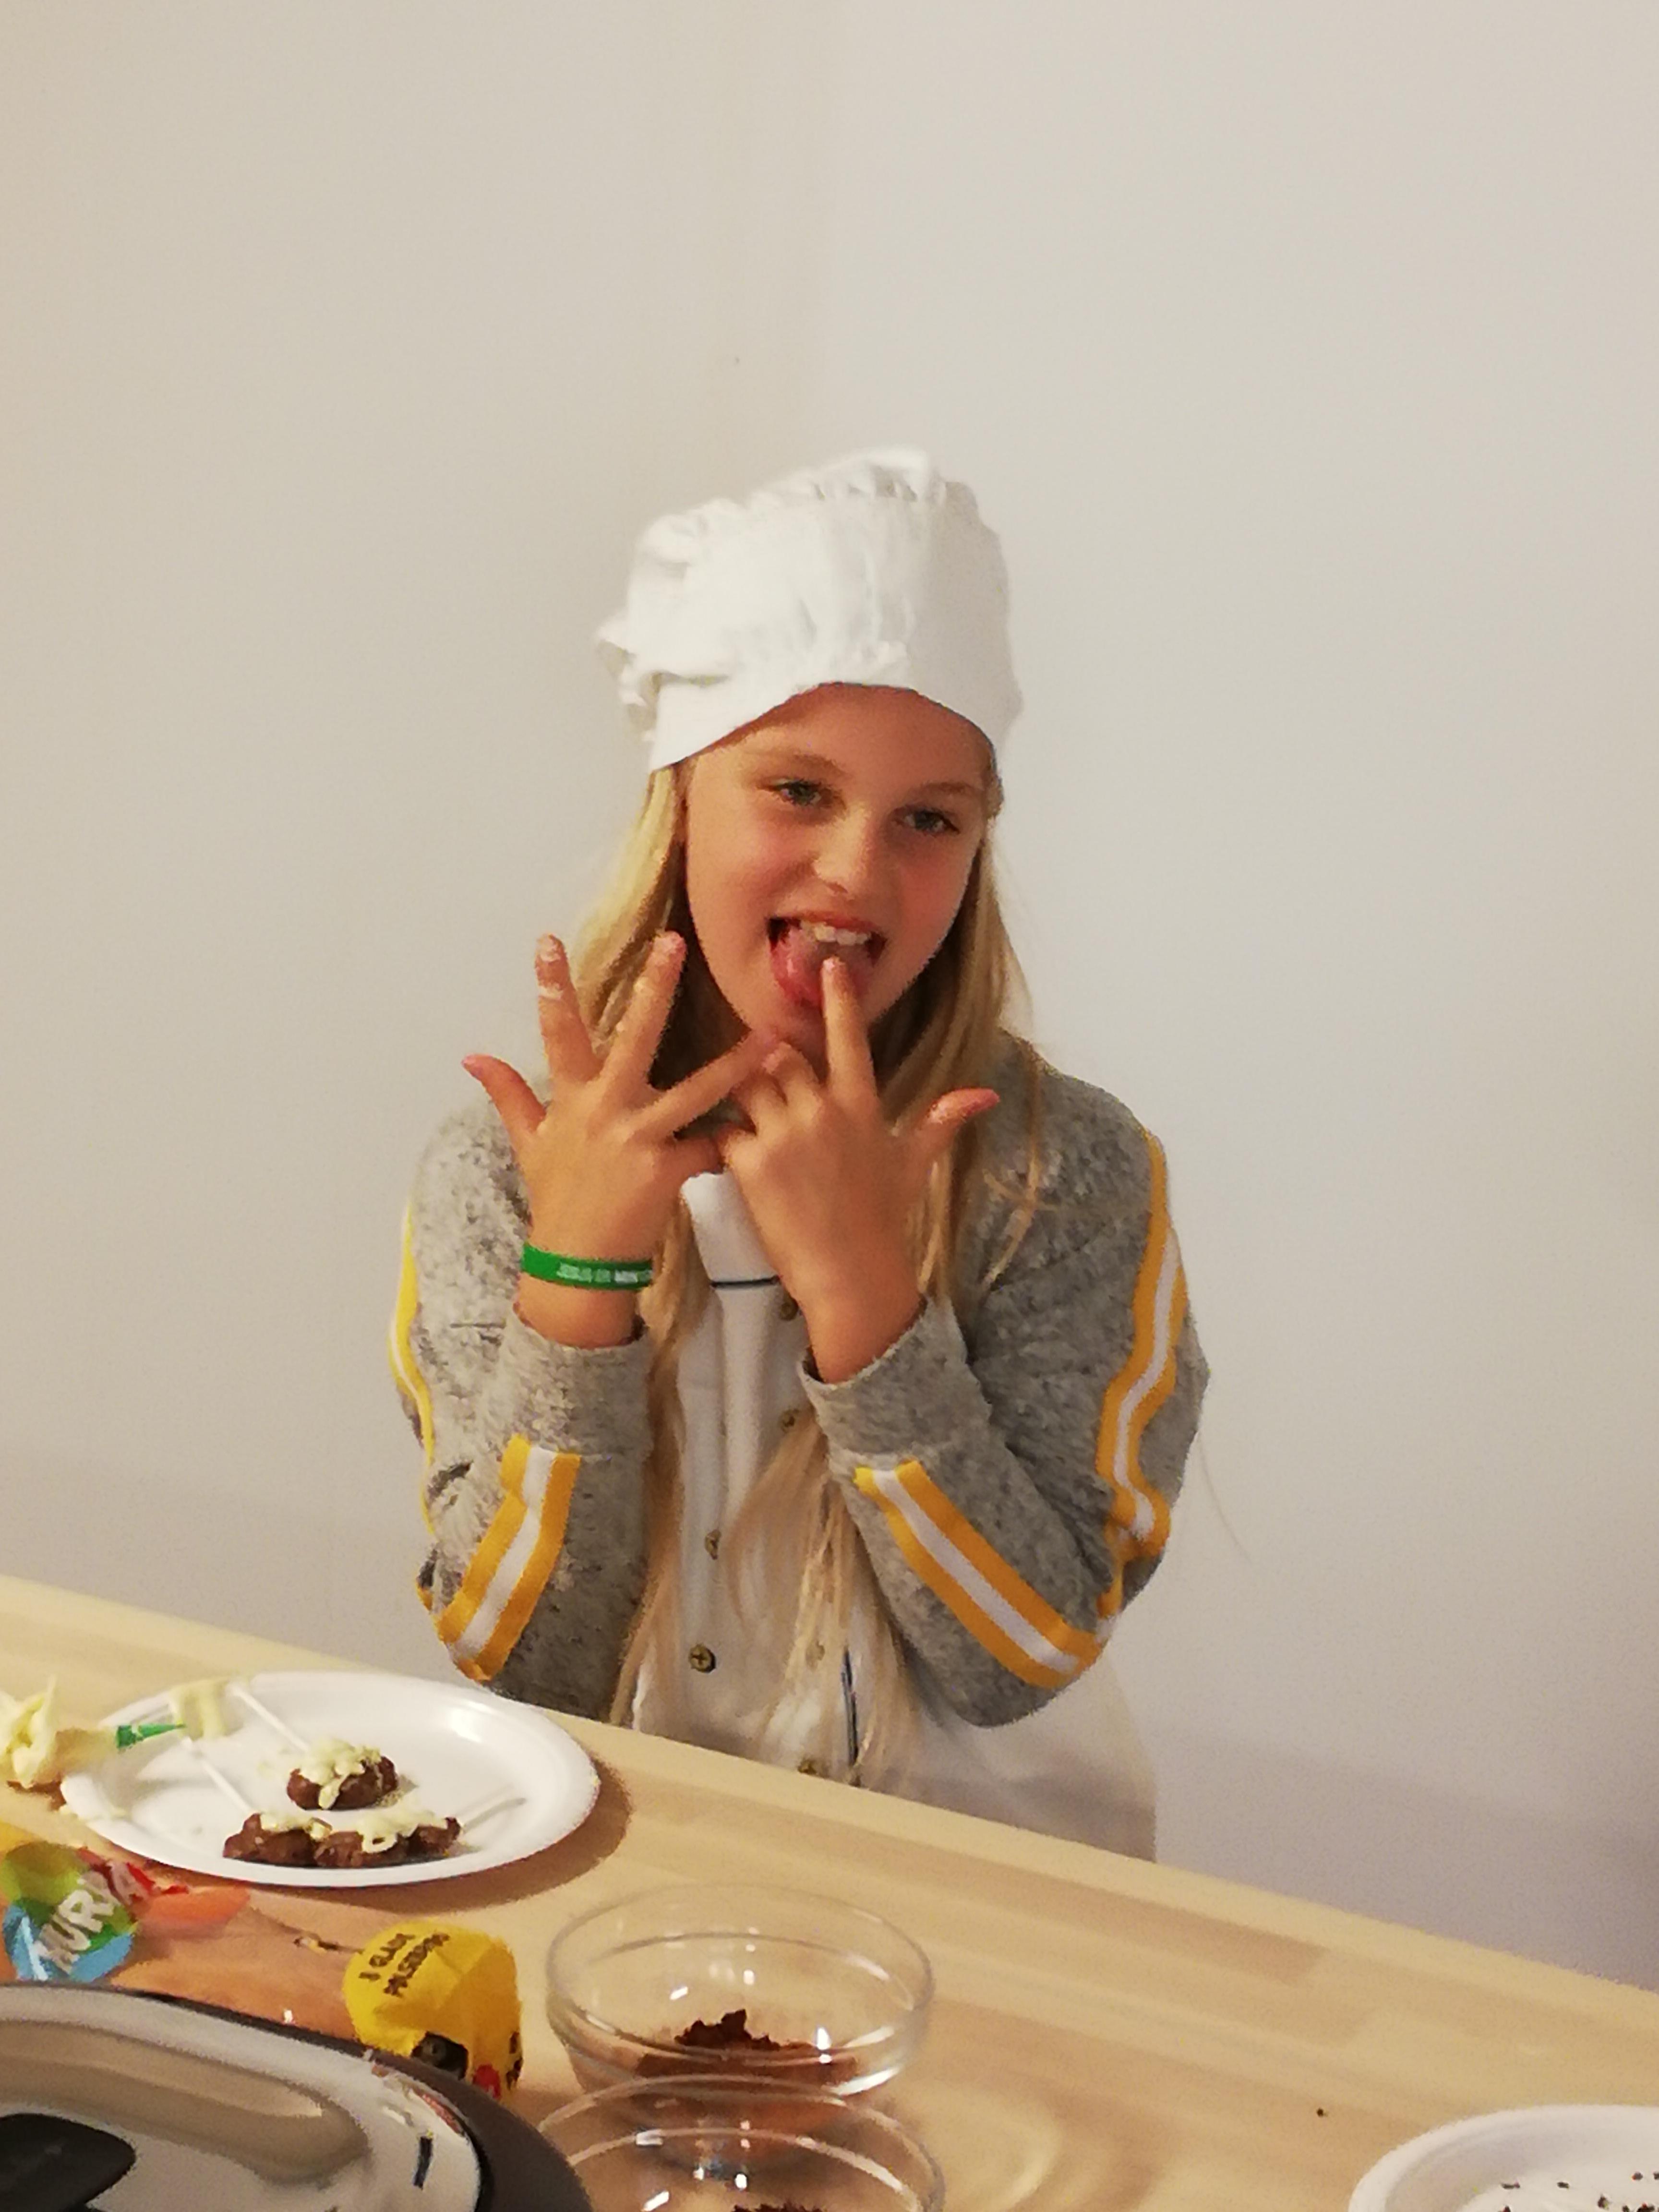 Sjokolade-bursdagfest